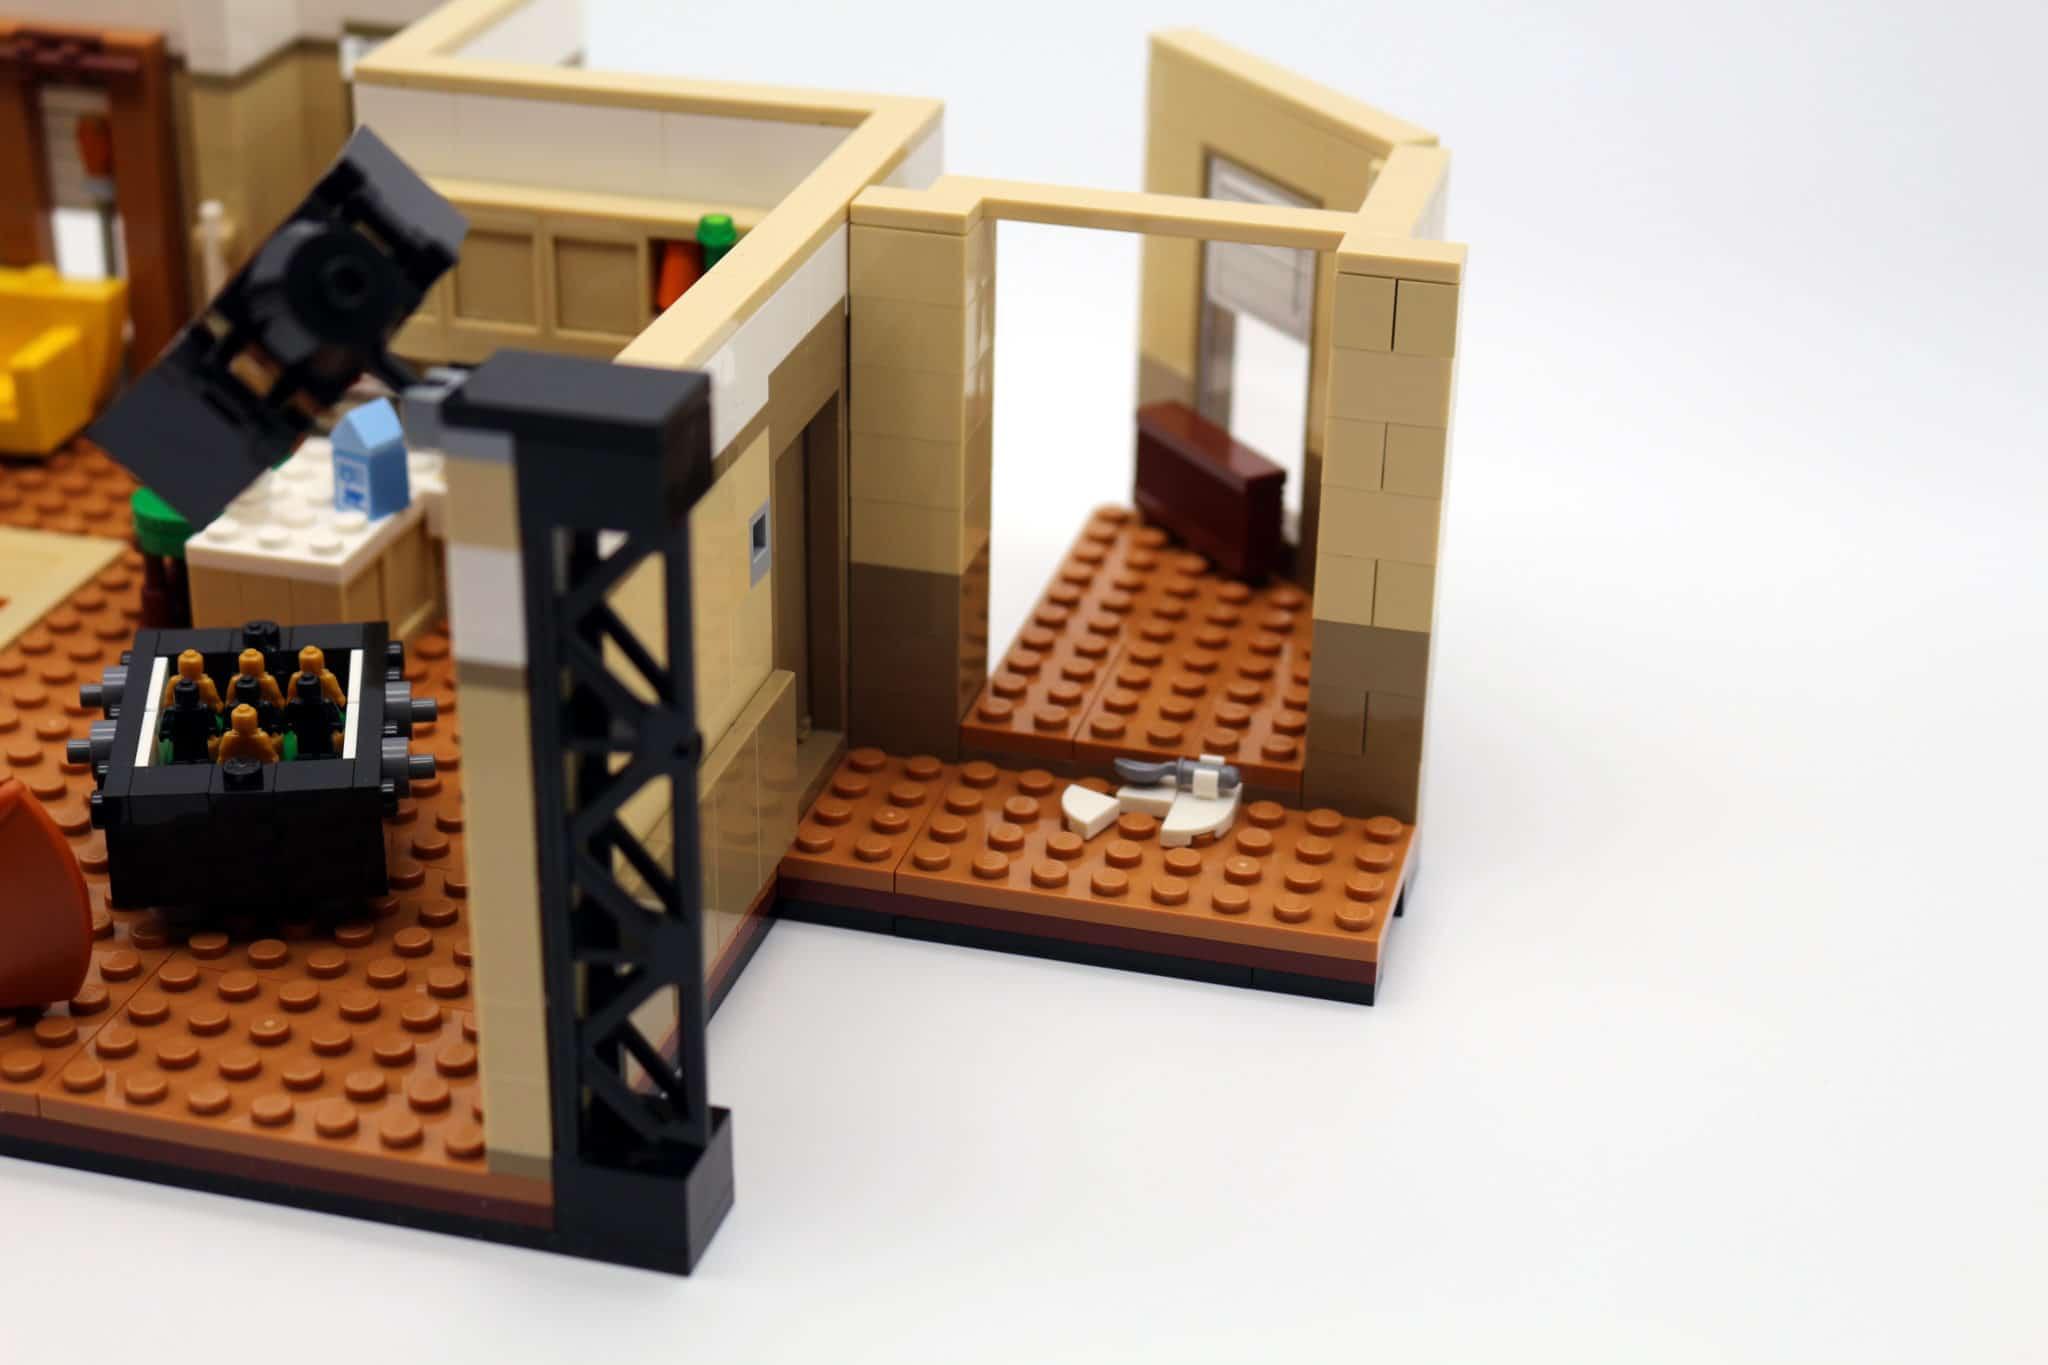 LEGO Friends 10292 The Friends Apartments 26